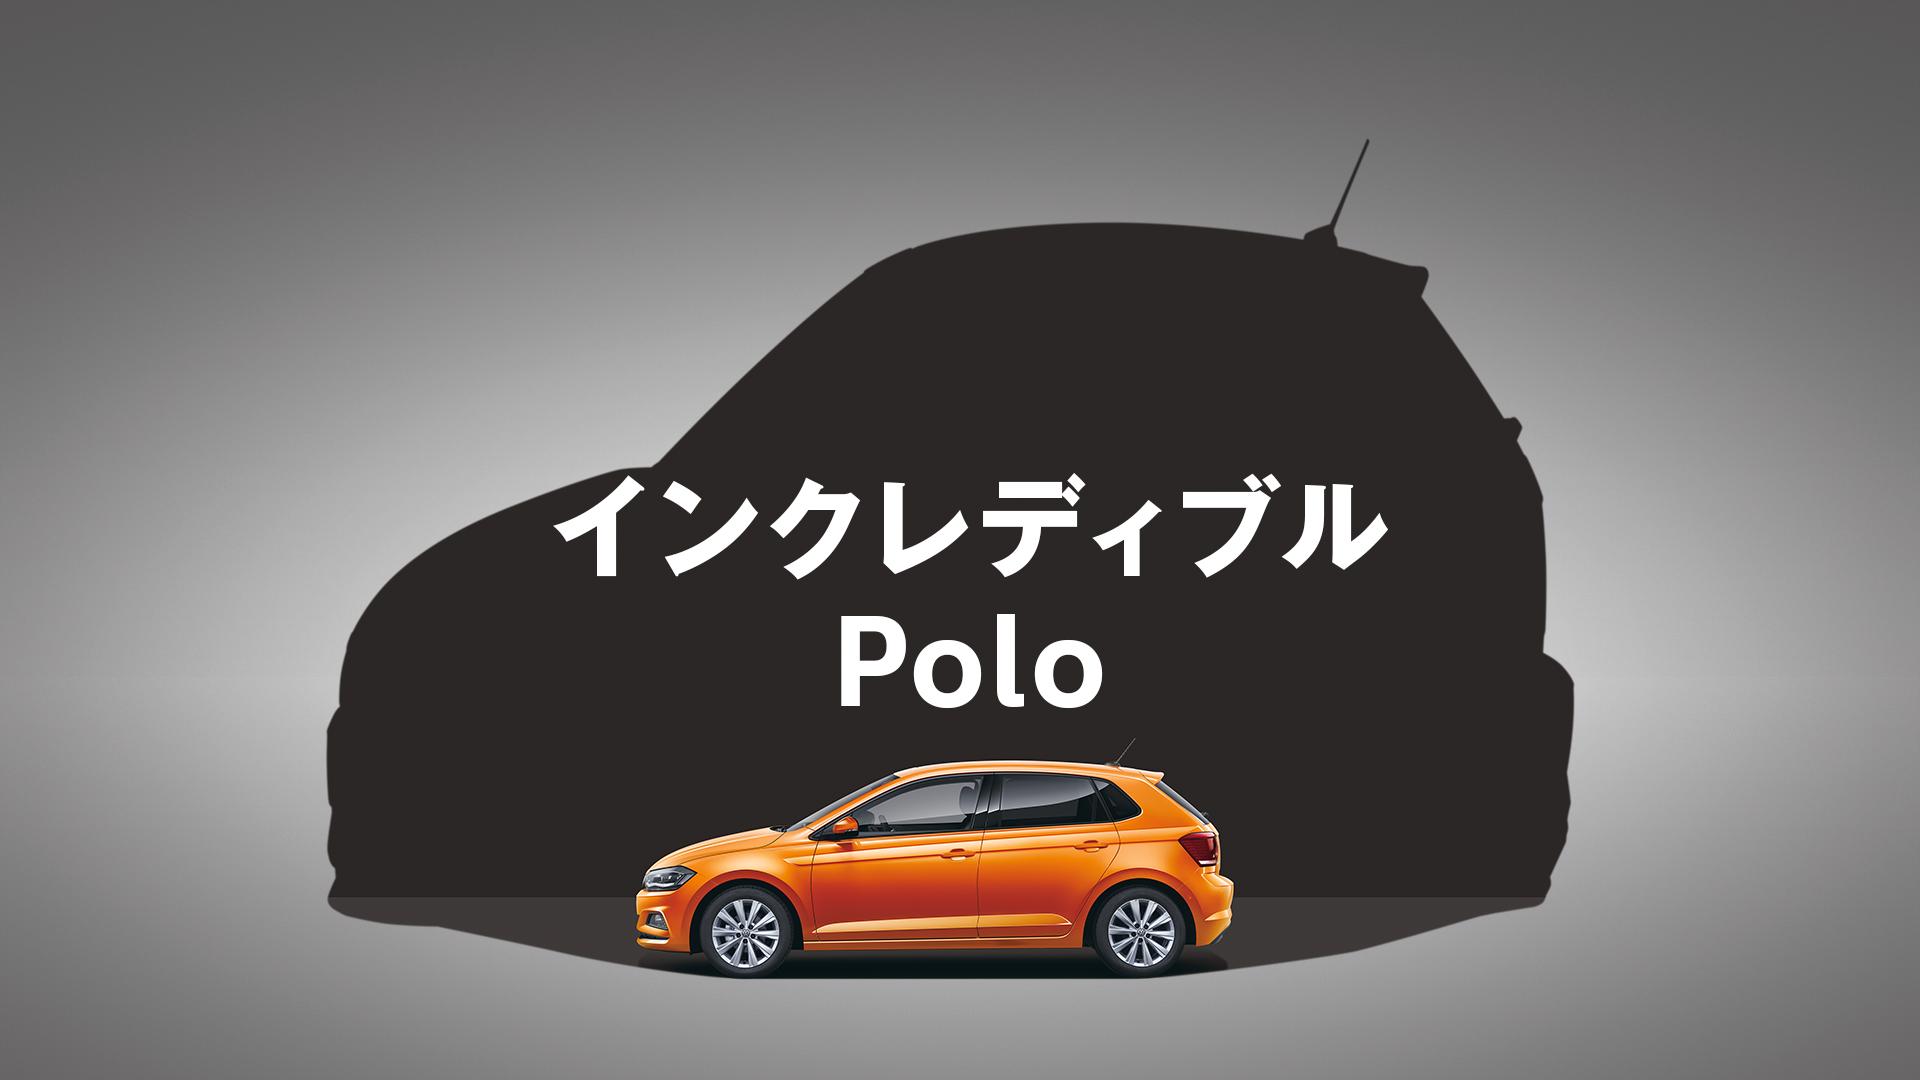 Polo Comfortline Limited デビュー